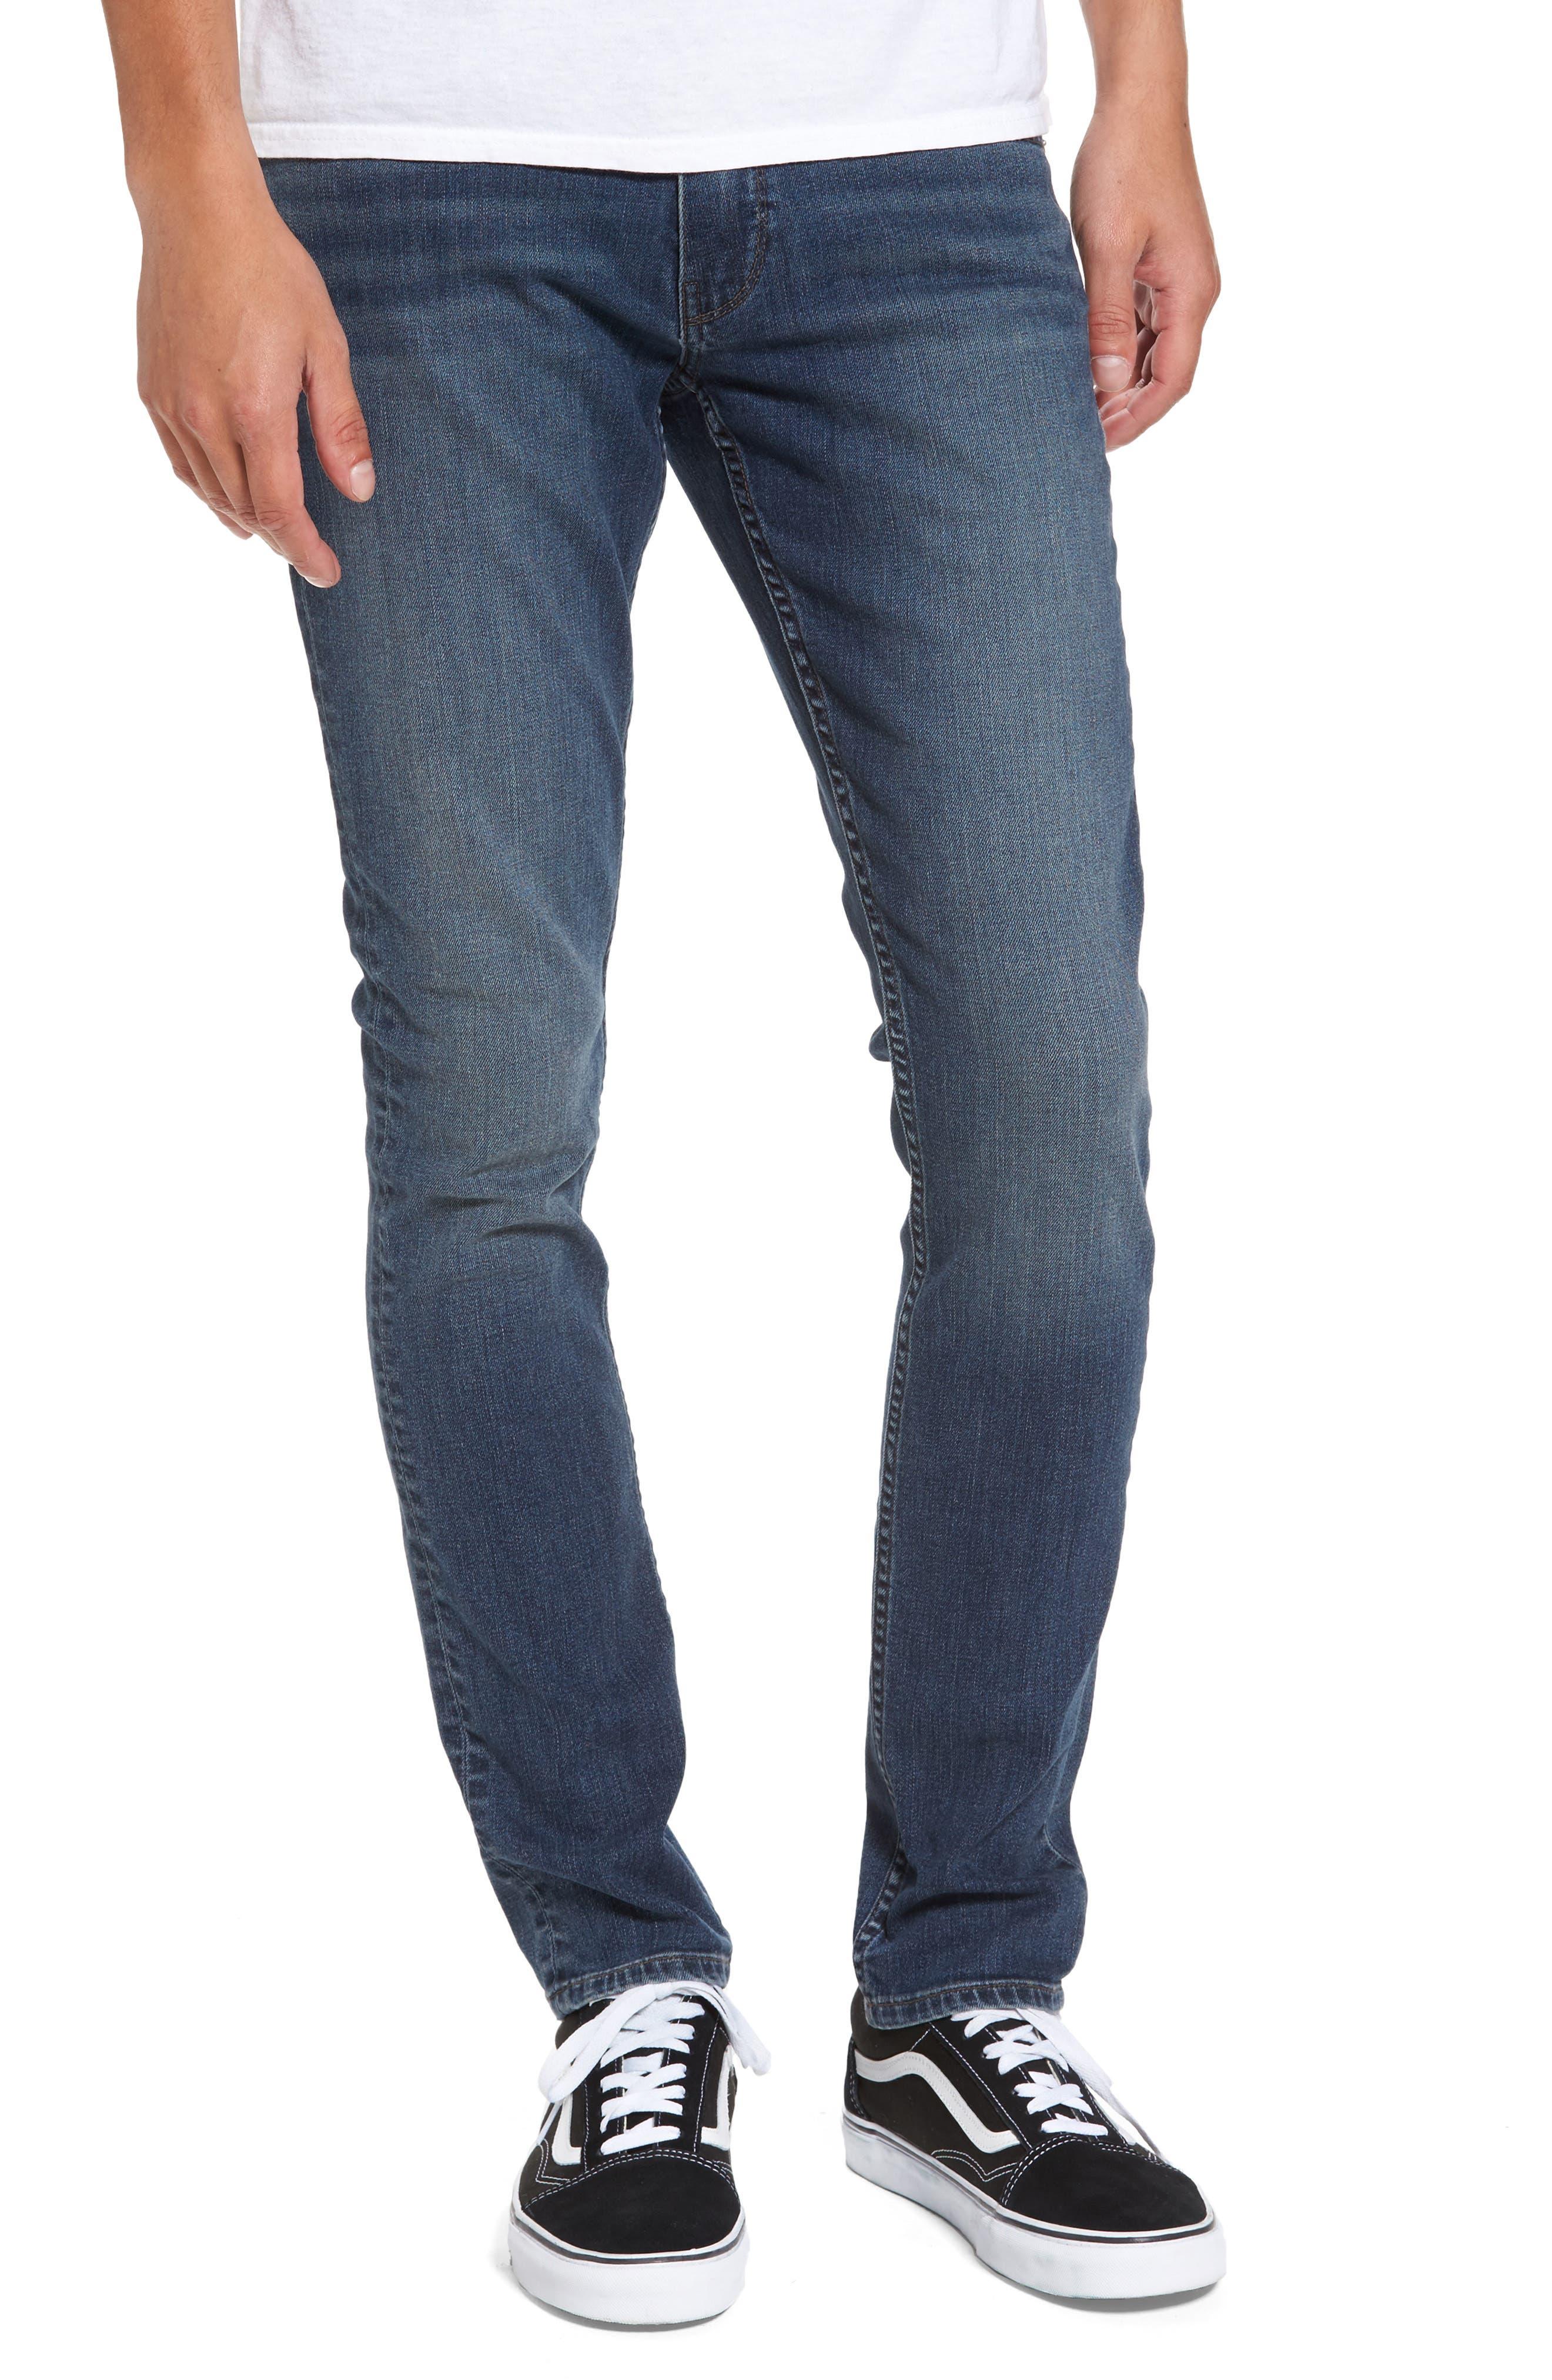 Legacy - Croft Skinny Jeans,                             Main thumbnail 1, color,                             400